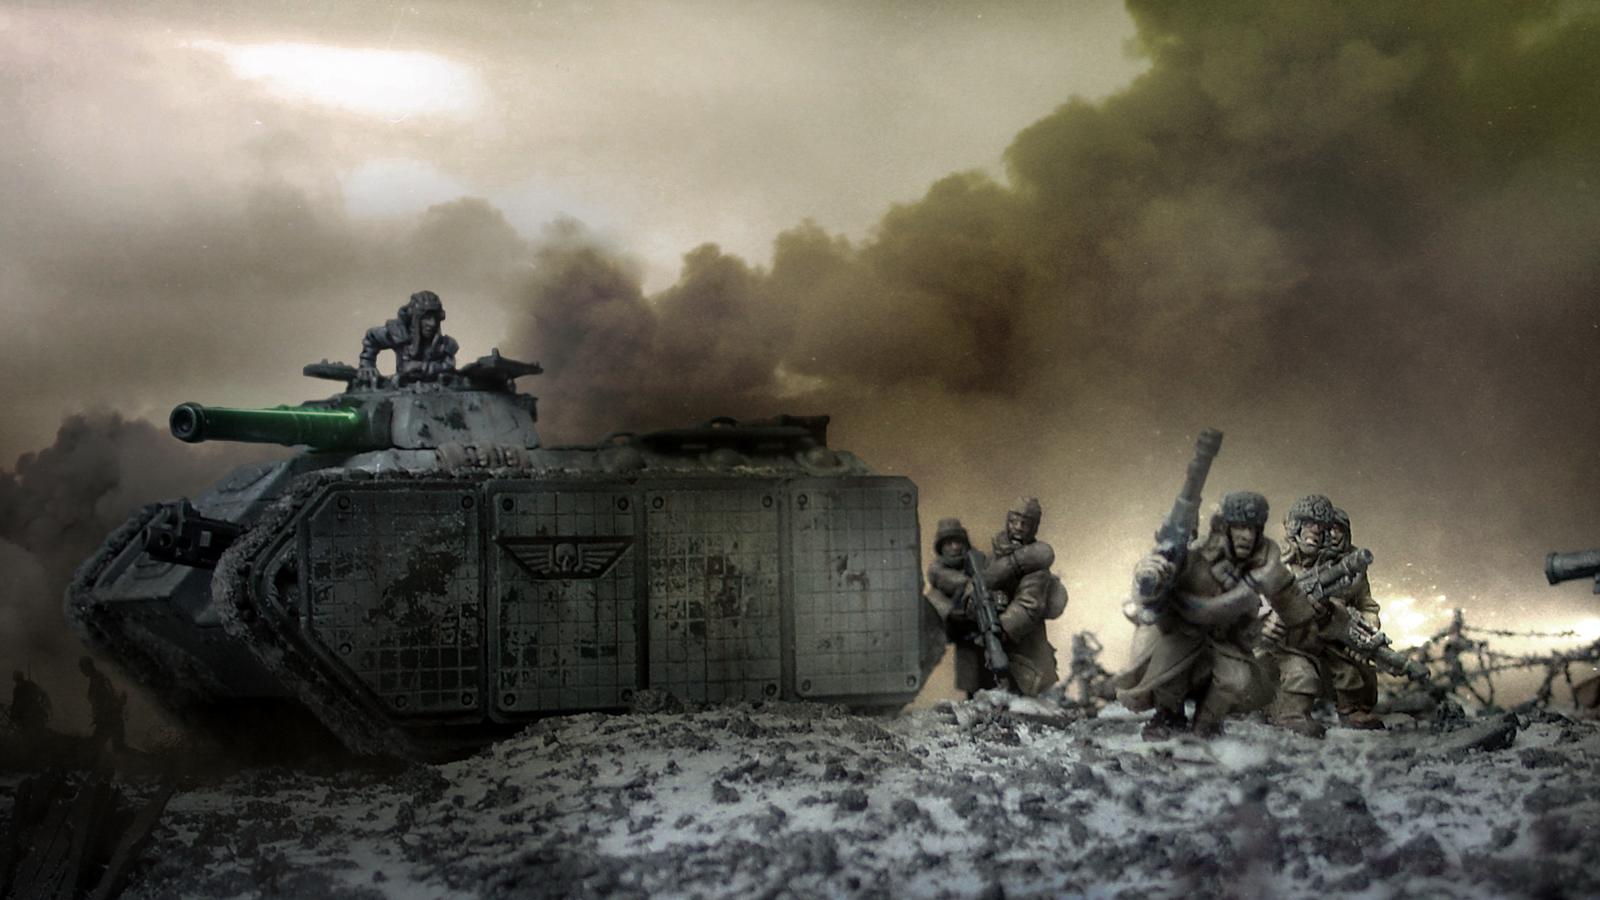 41st_valhallan_operation_kaprov_by_arkurion-d5nmccx.png